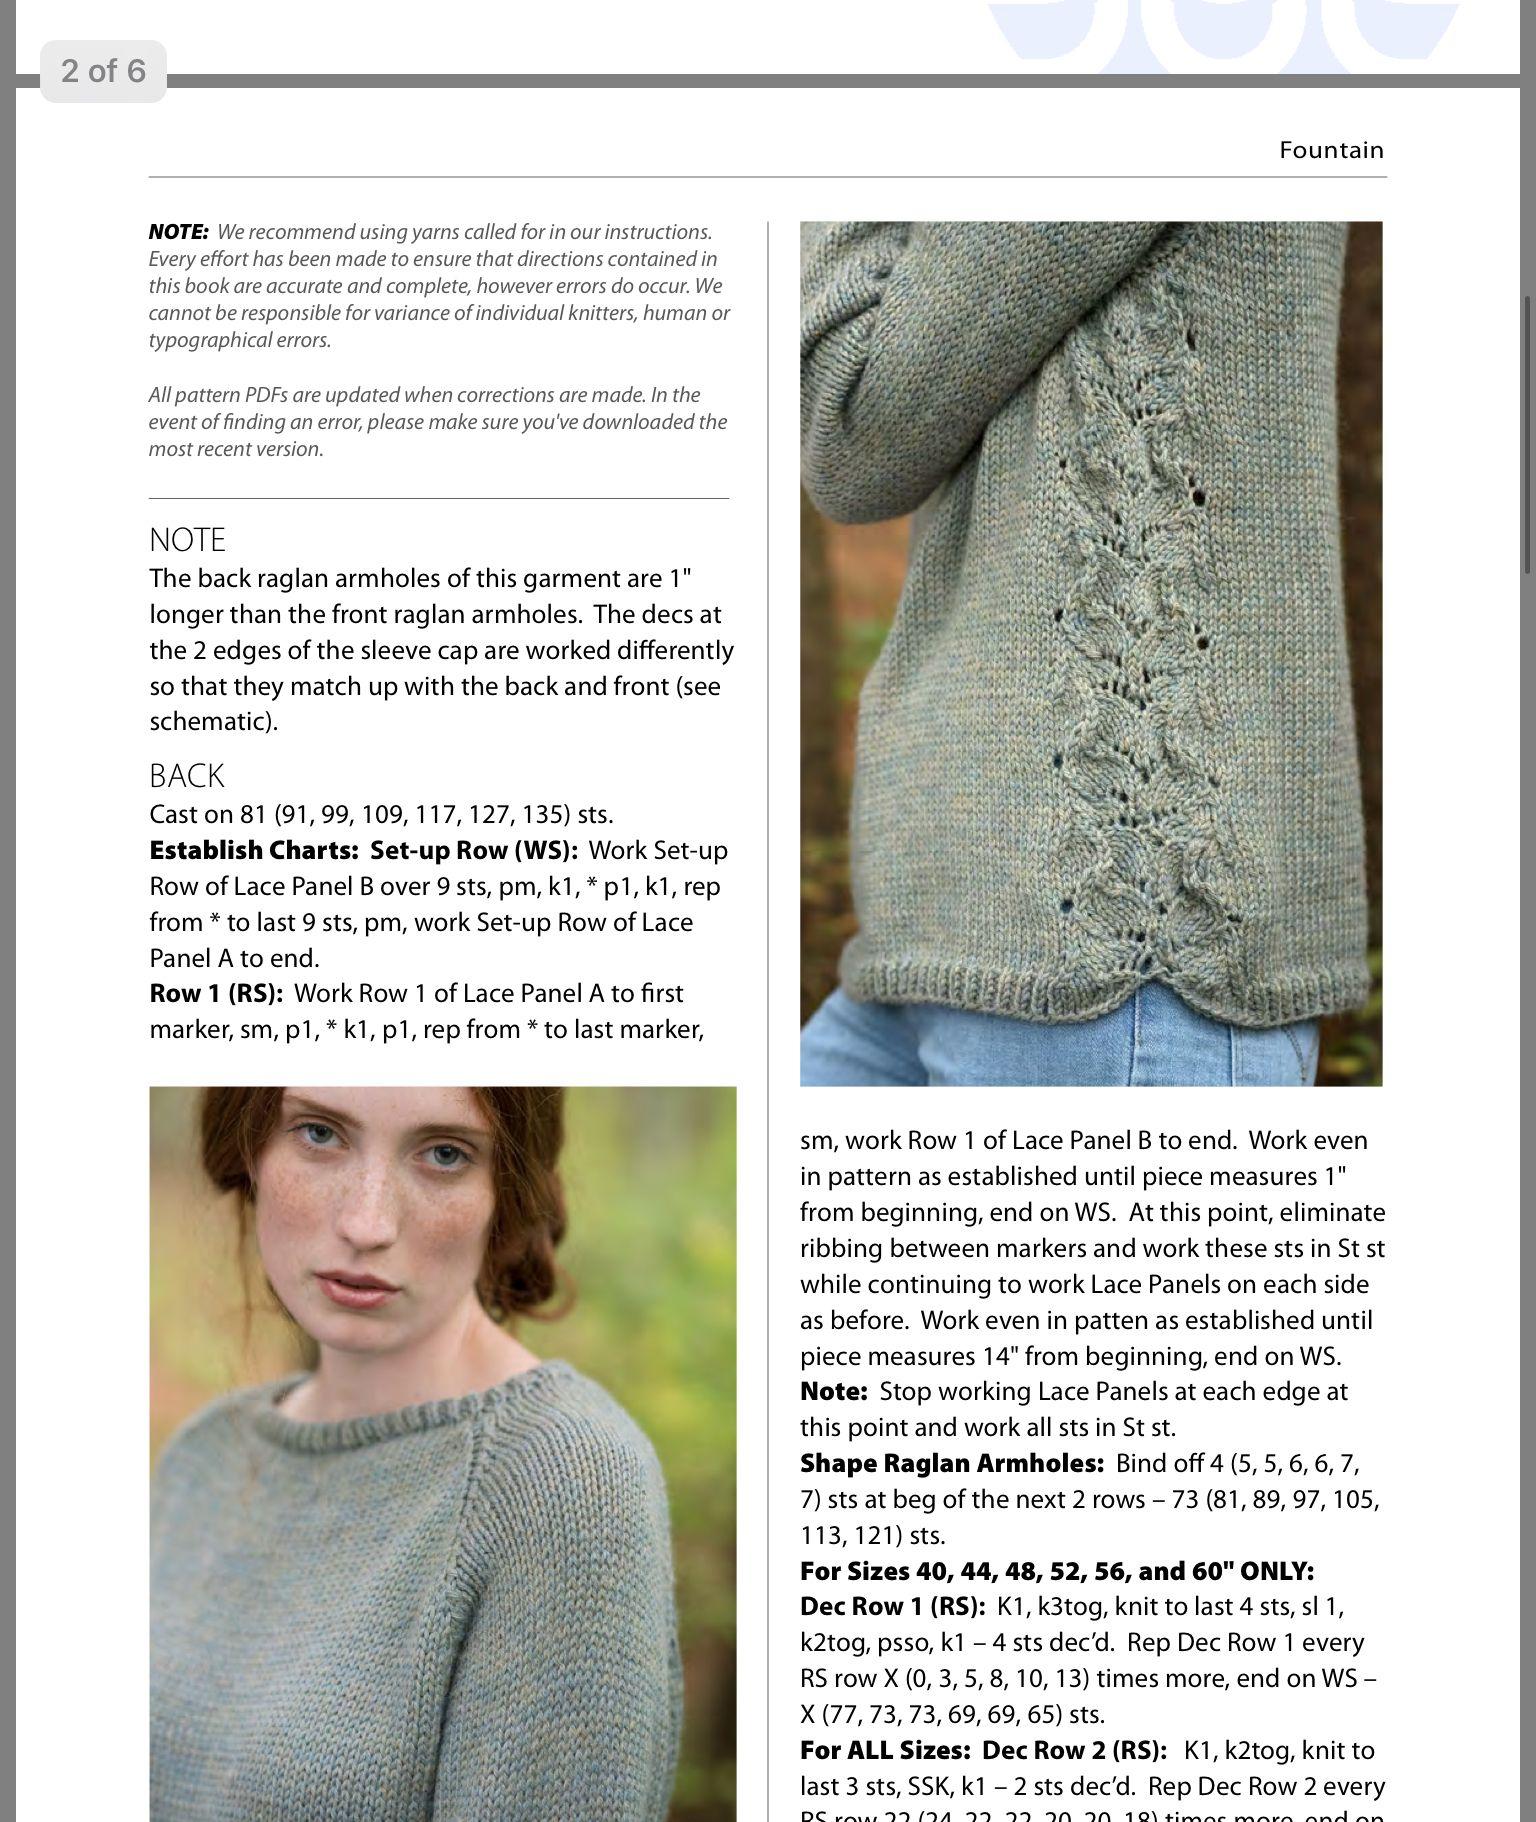 Pin by Selina Wall on Knitting | Pinterest | Knitting, Filing and ...